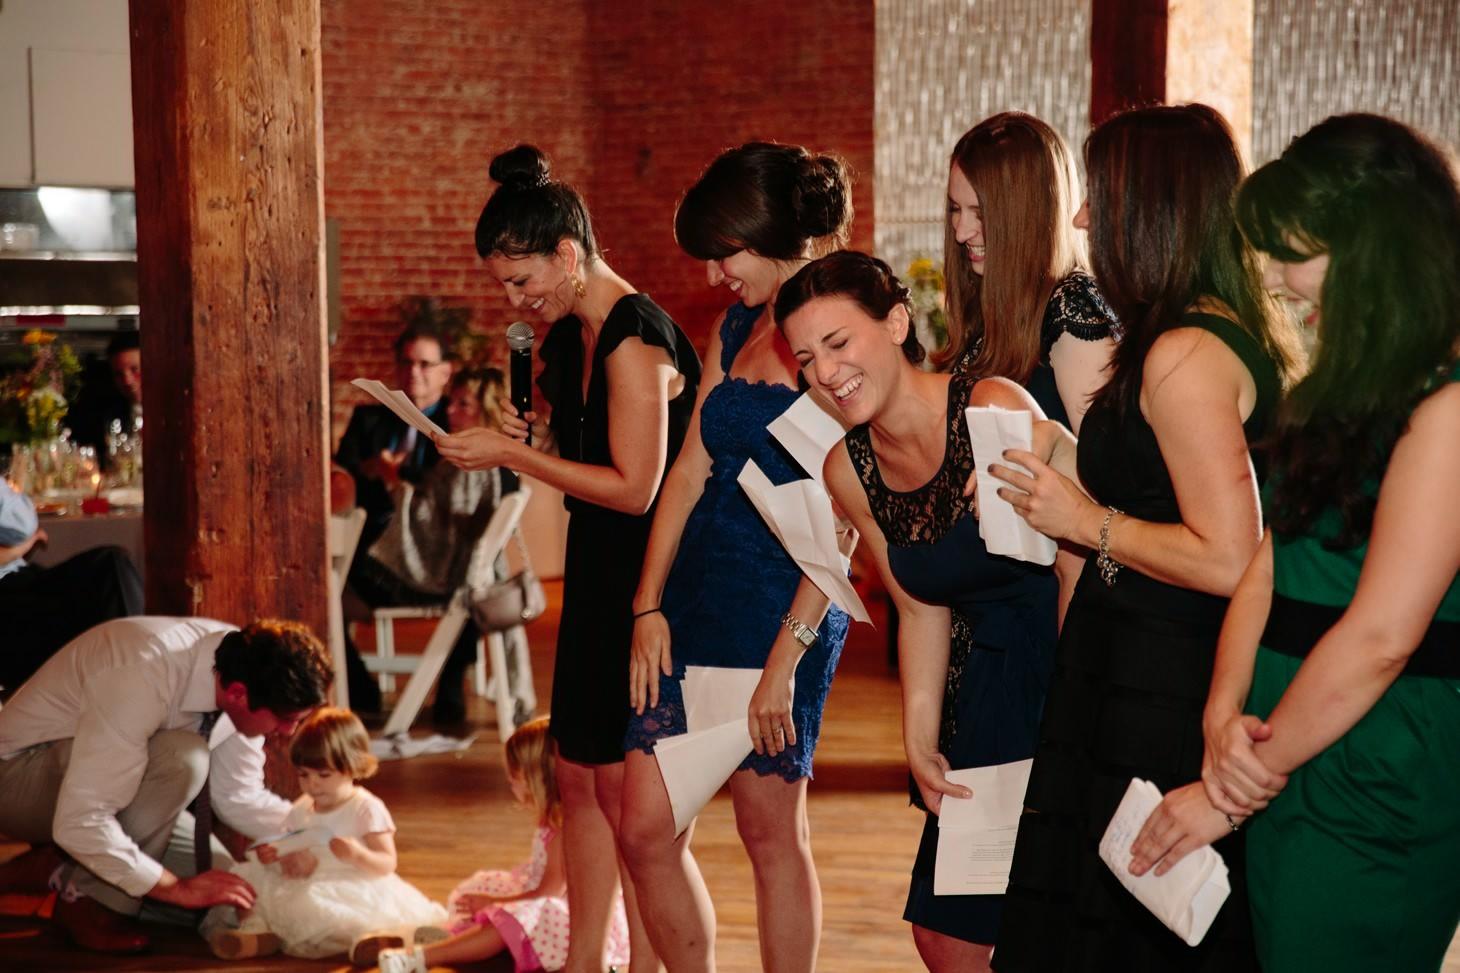 044-nyc-dumbo-loft-brooklyn-wedding-photographer-smitten-chickens-photo-.jpg